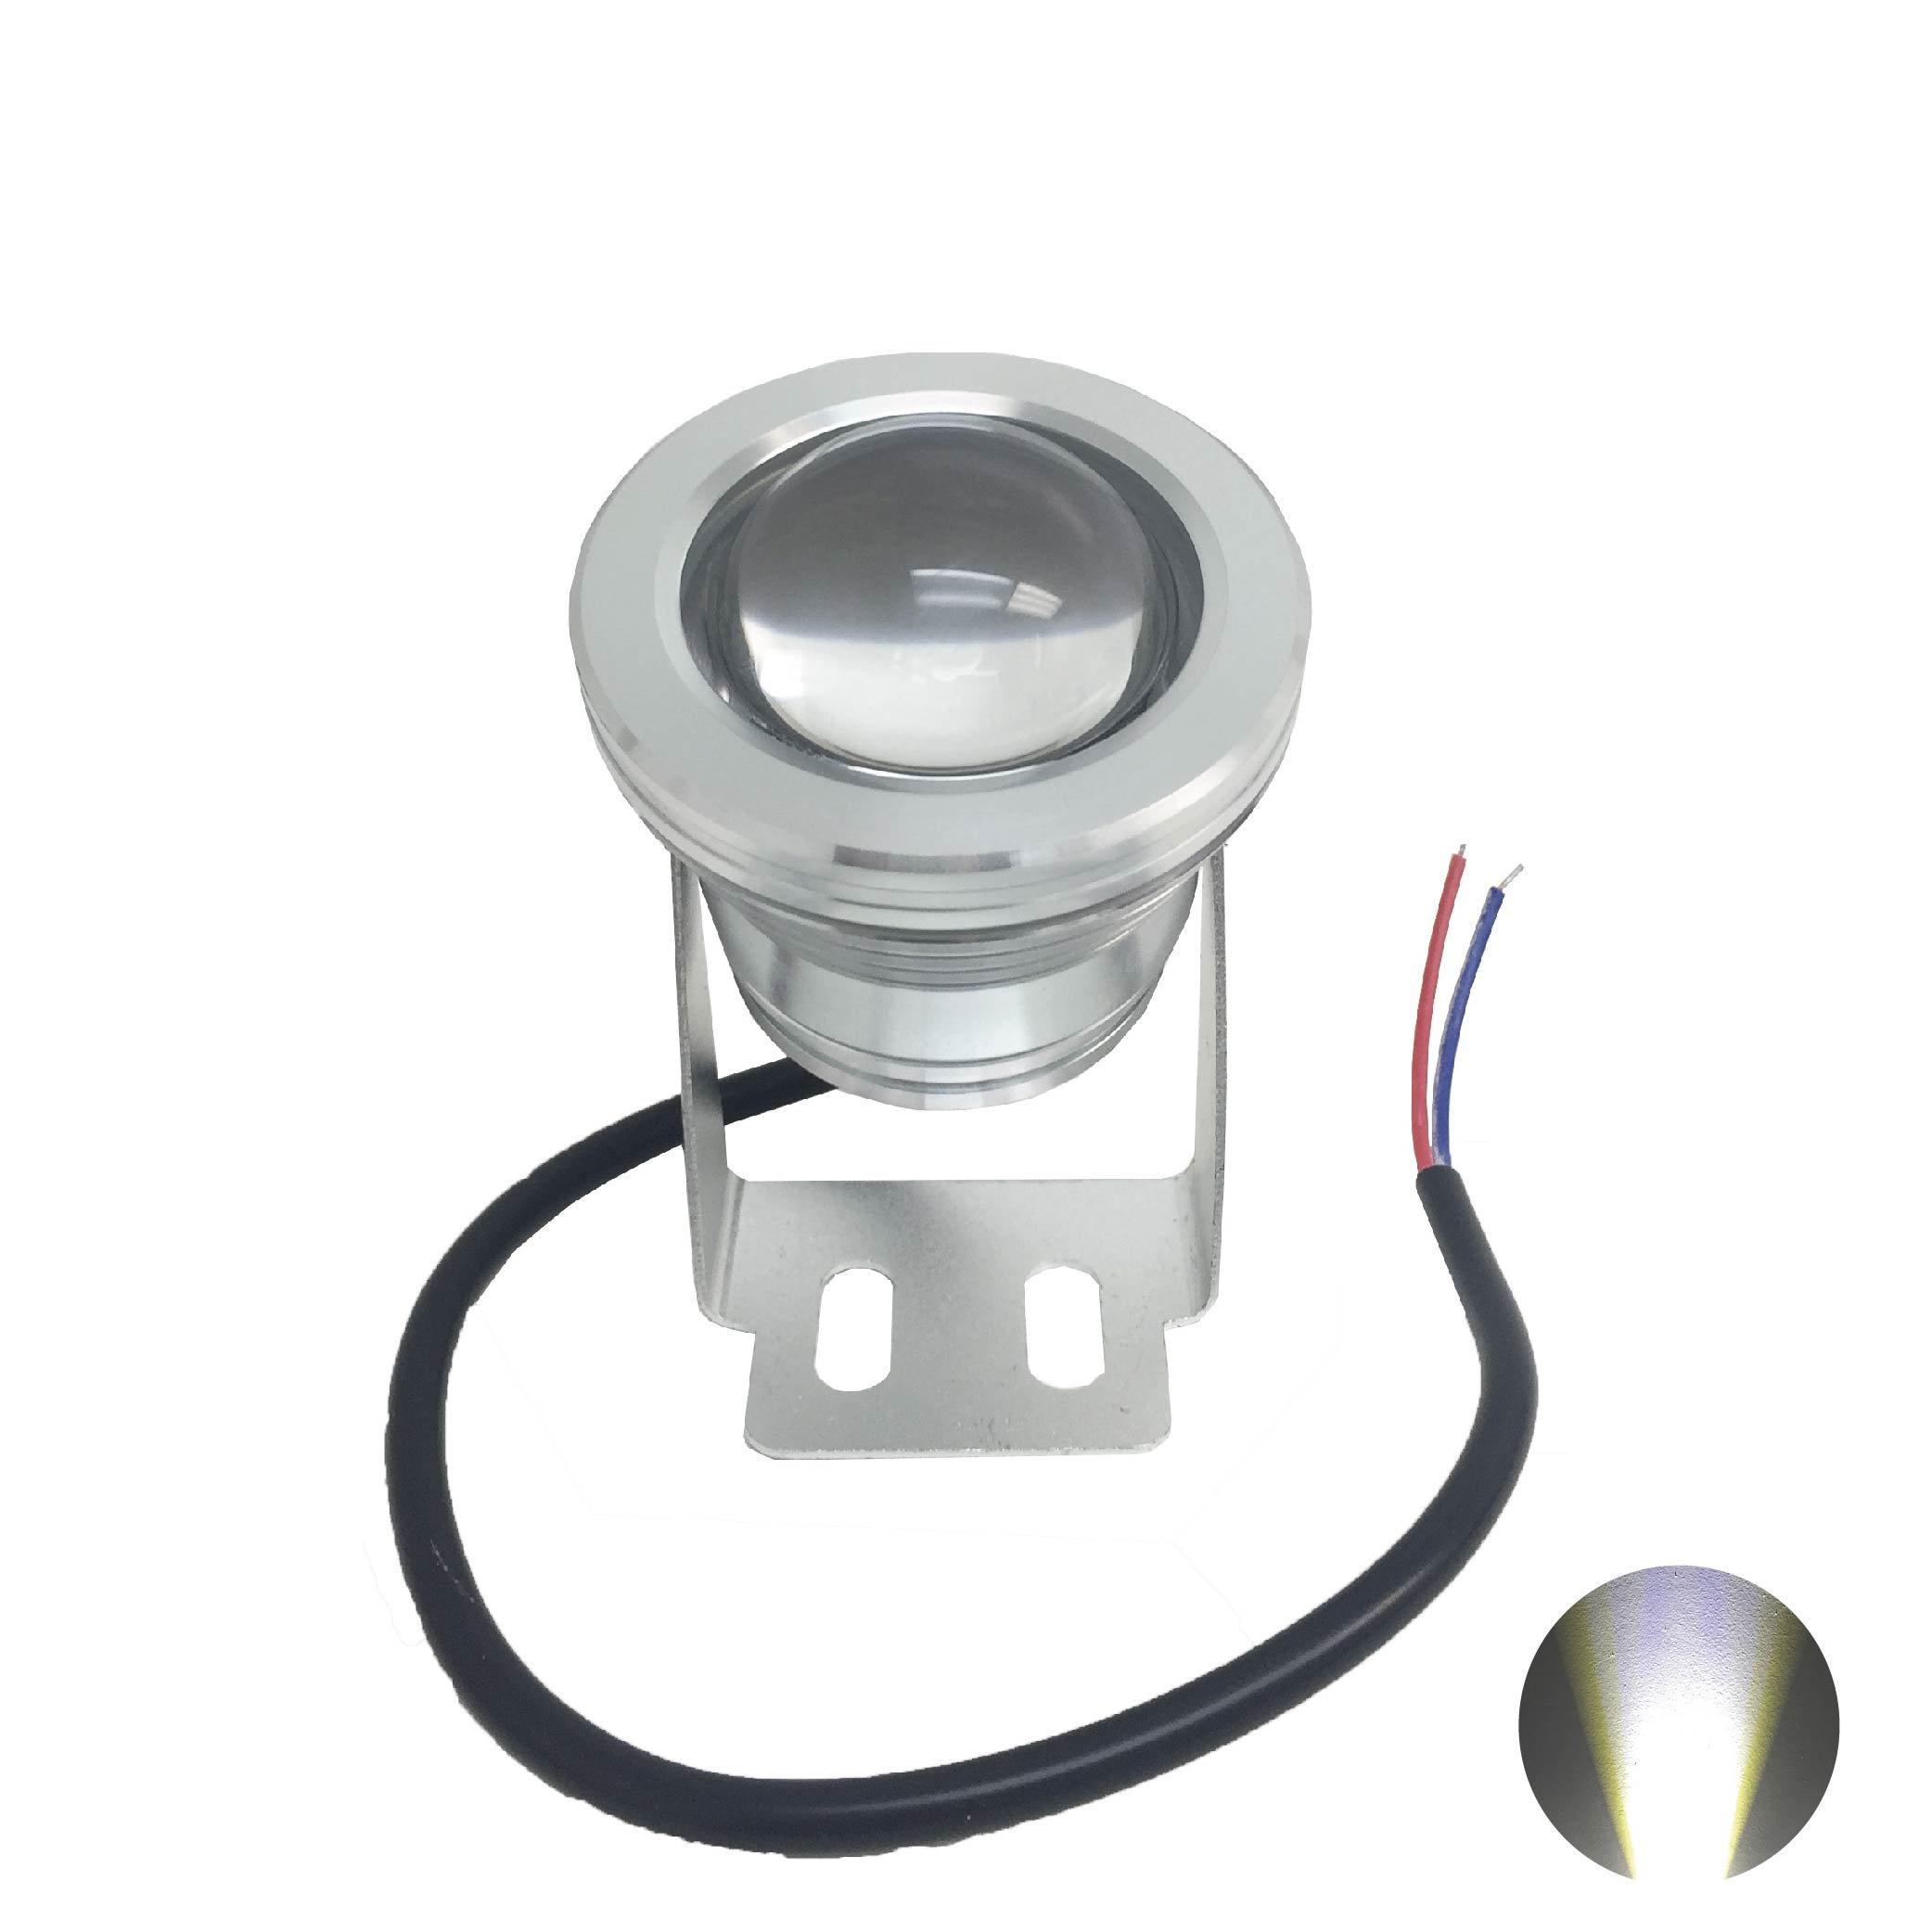 DEMASLED - 10W 12V Cool Withe LED Flood Light + Remote Control. Light Lamp for Landscape Fountain Pond Lighting